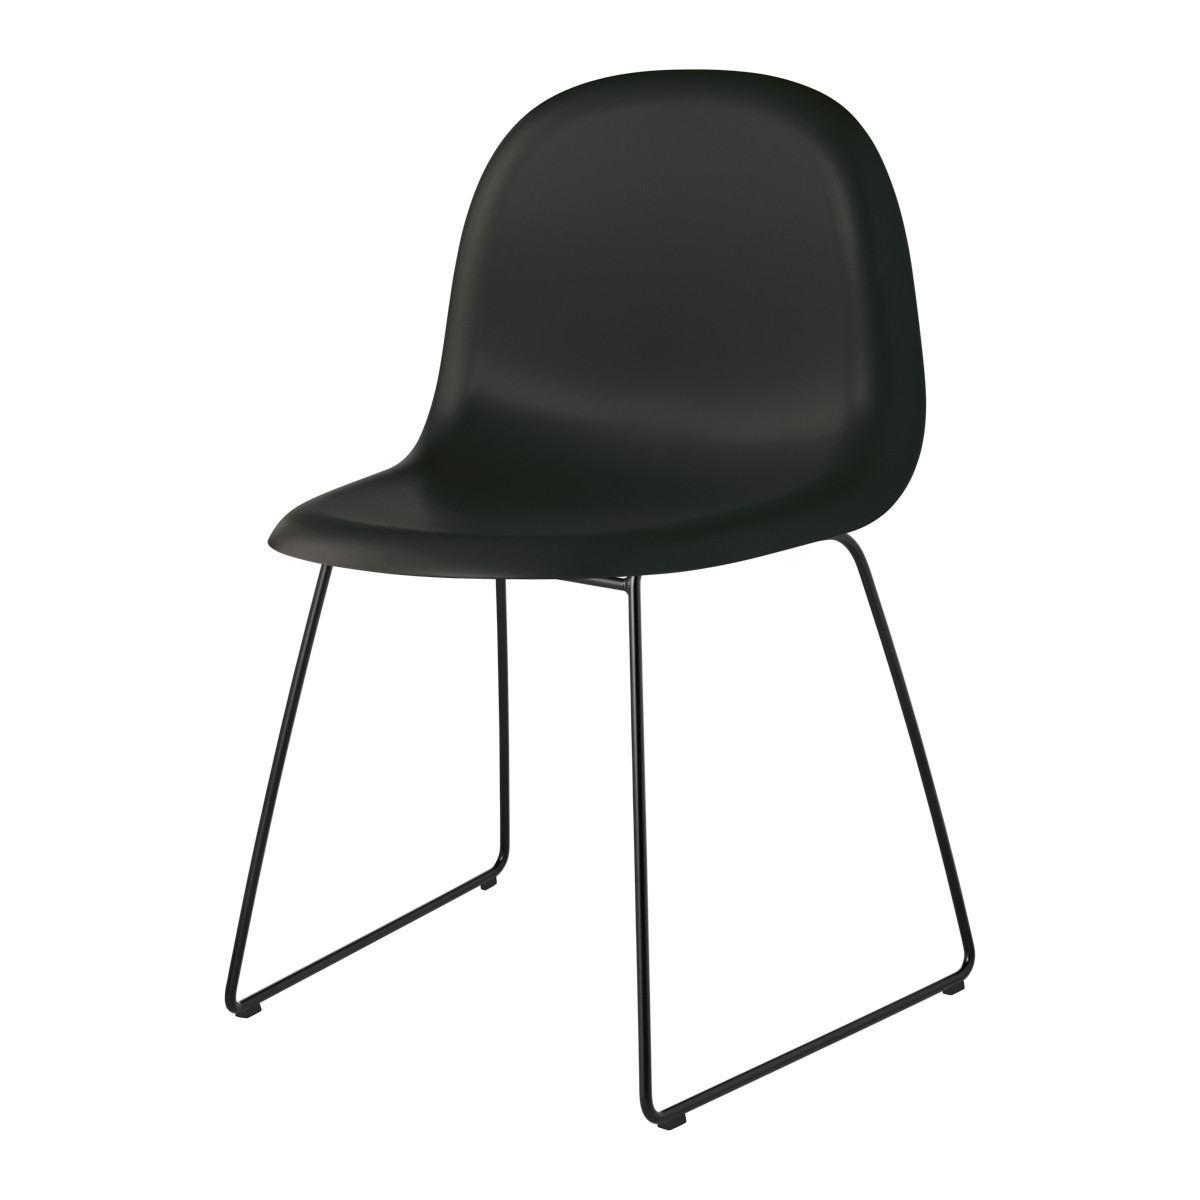 Gubi 3D Dining Chair - Un-Upholstered - Sledge Base, Stackable